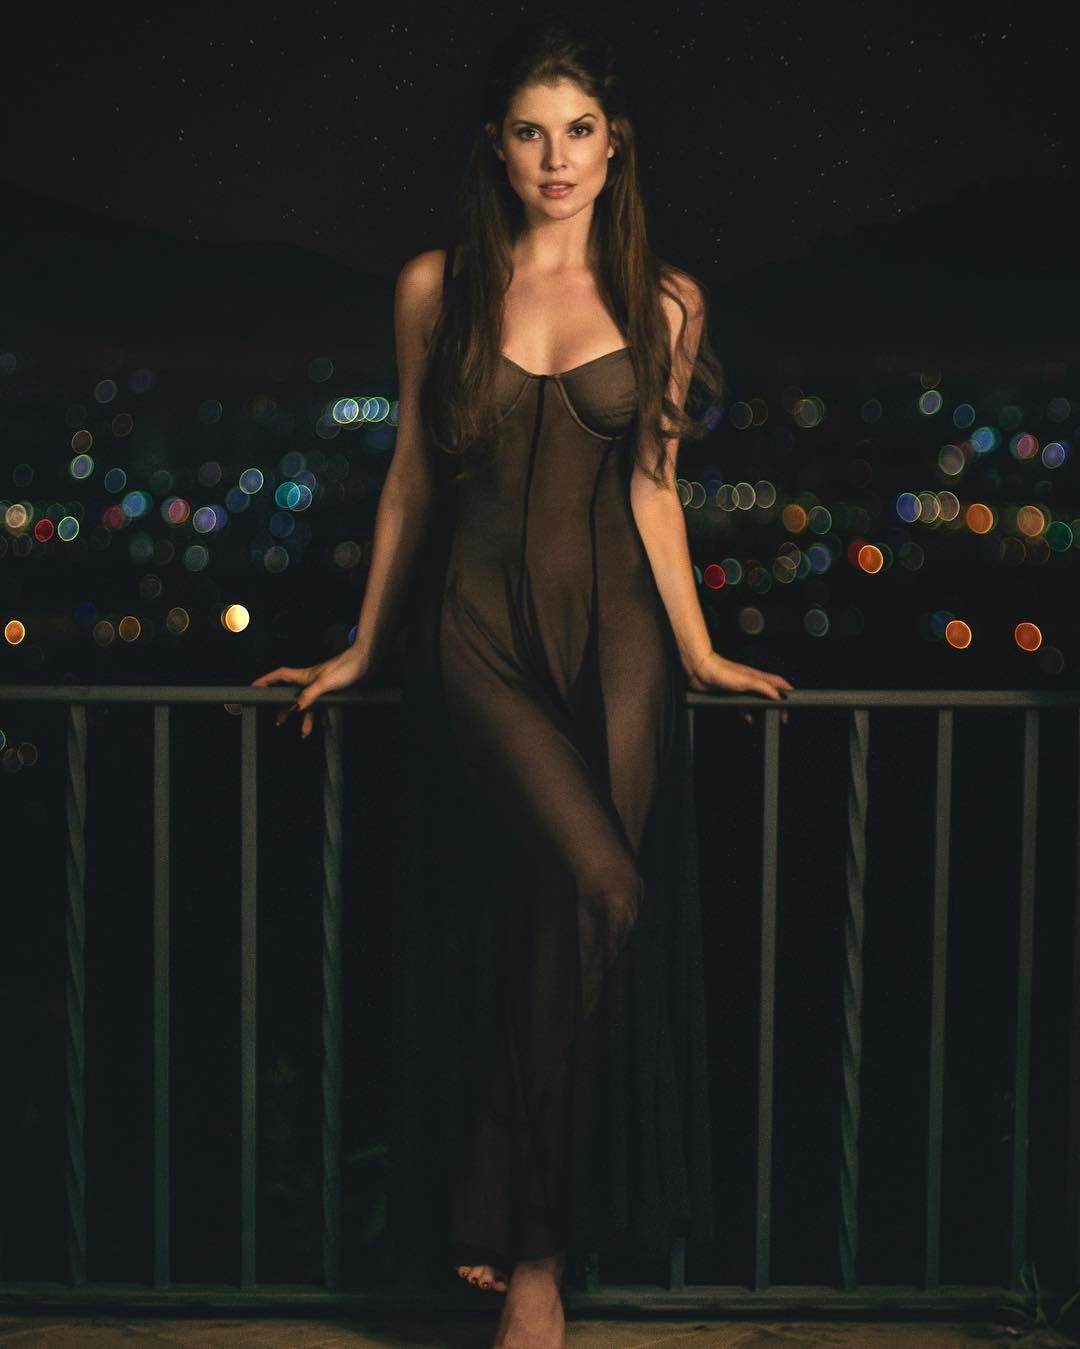 Amanda Cerny nackt Bilder